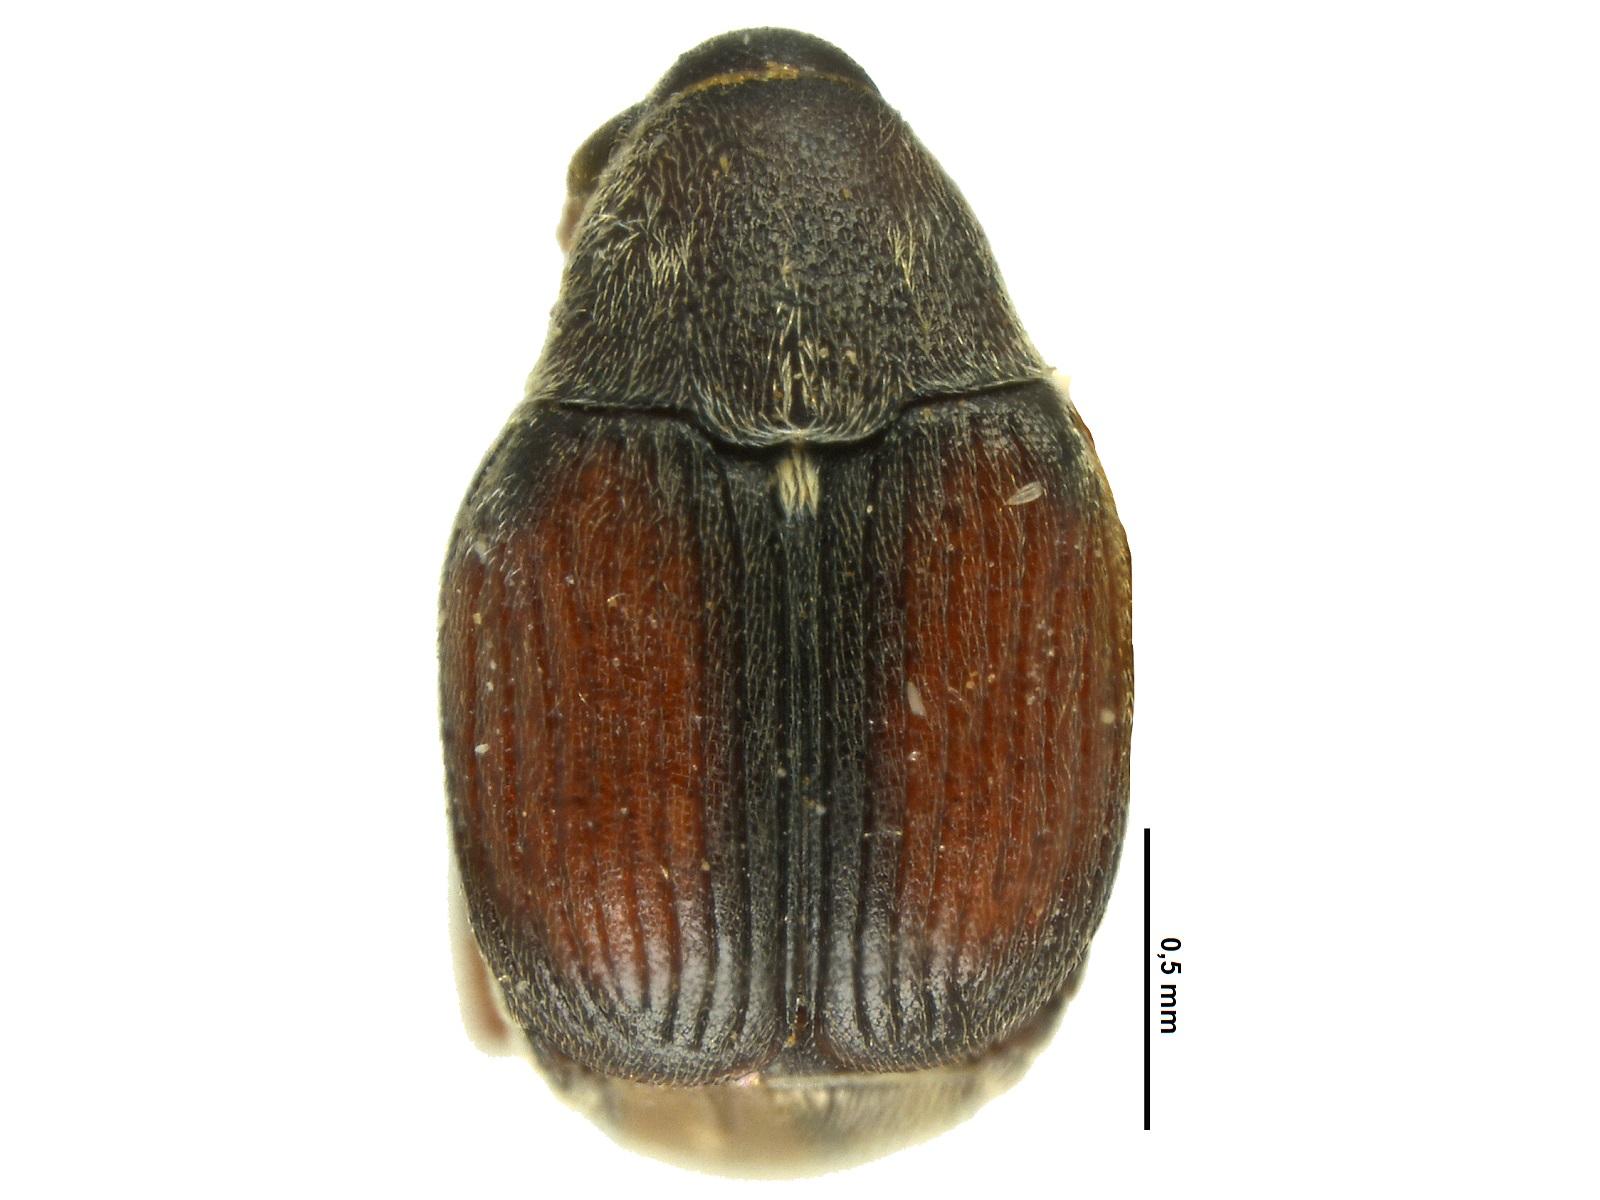 Acanthoscelides colombia Johnson, 1990